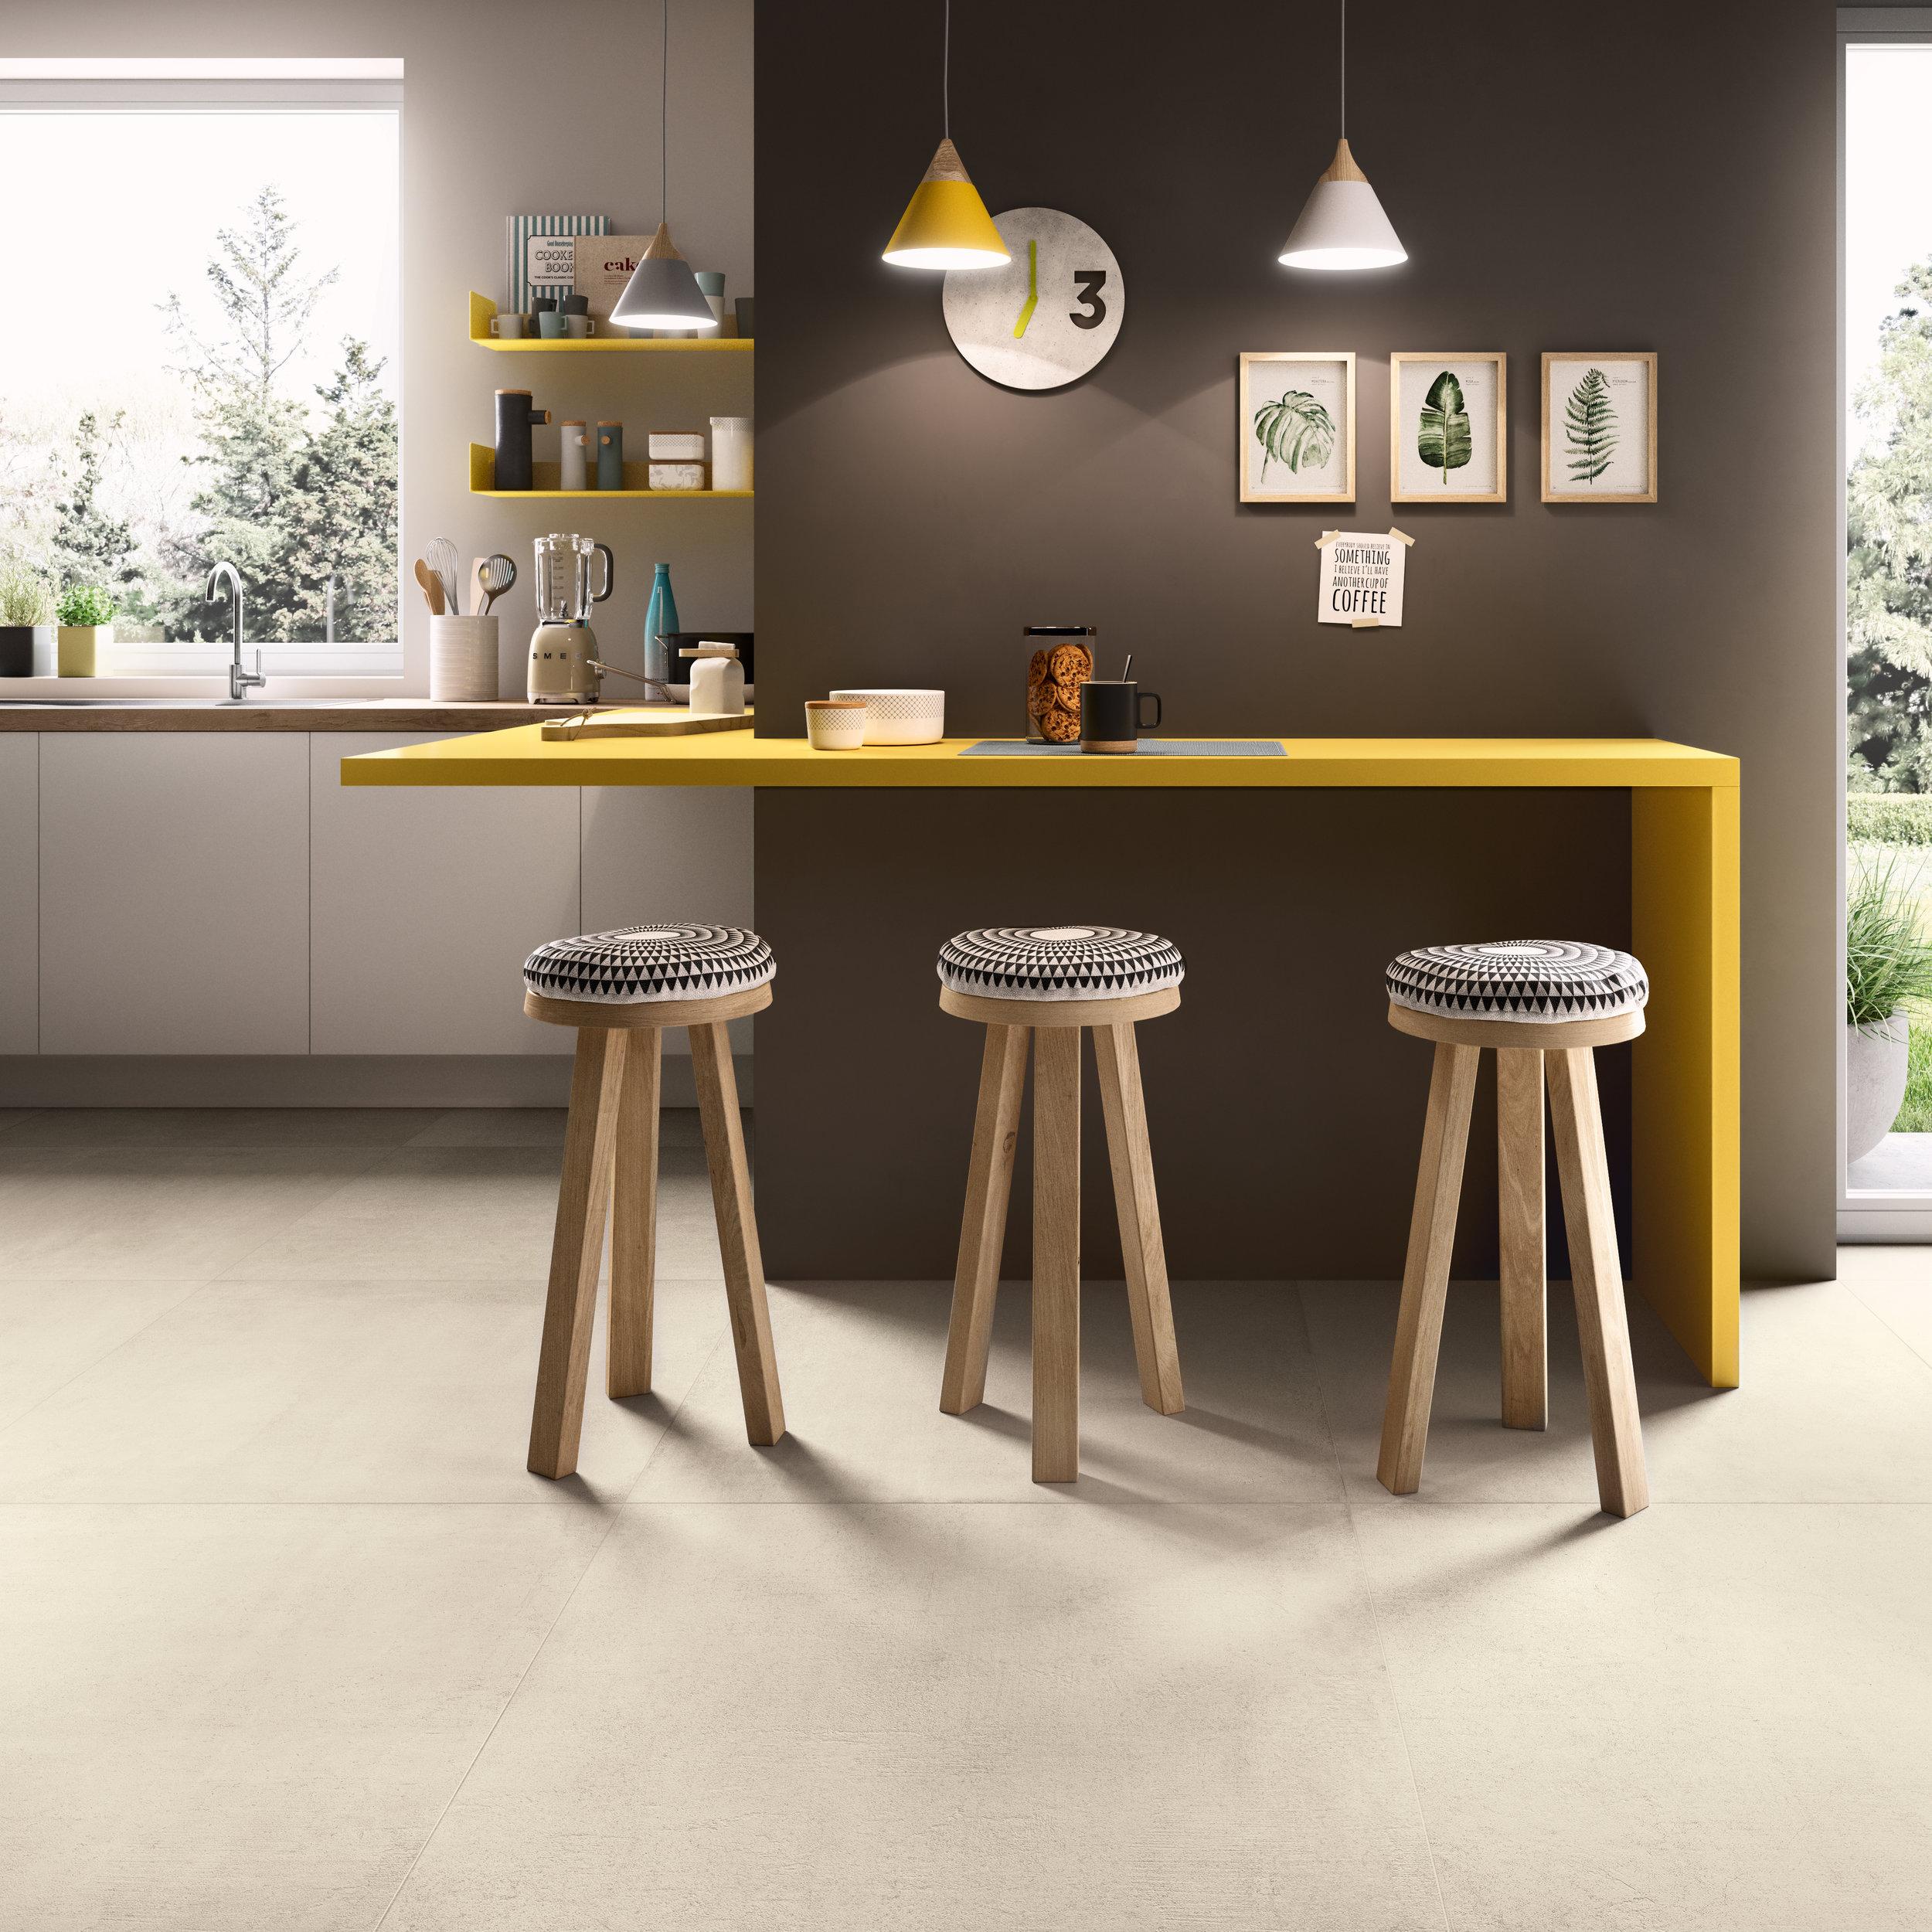 BLU-concretejungle-atelier25-natural-11mm-kitchen-001.jpg